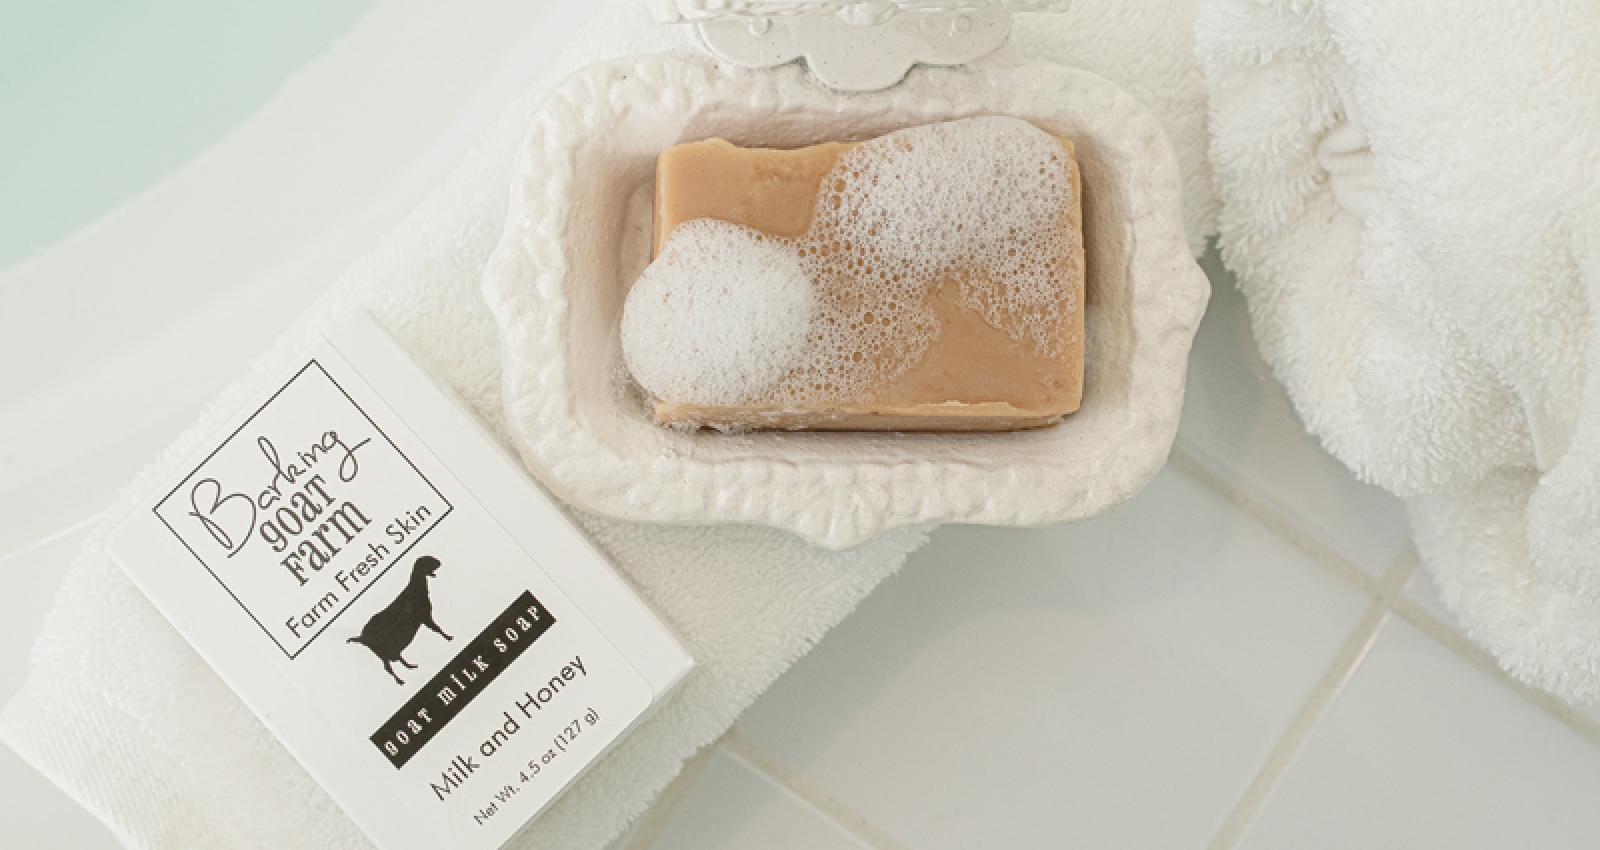 Barking Goat bath soap